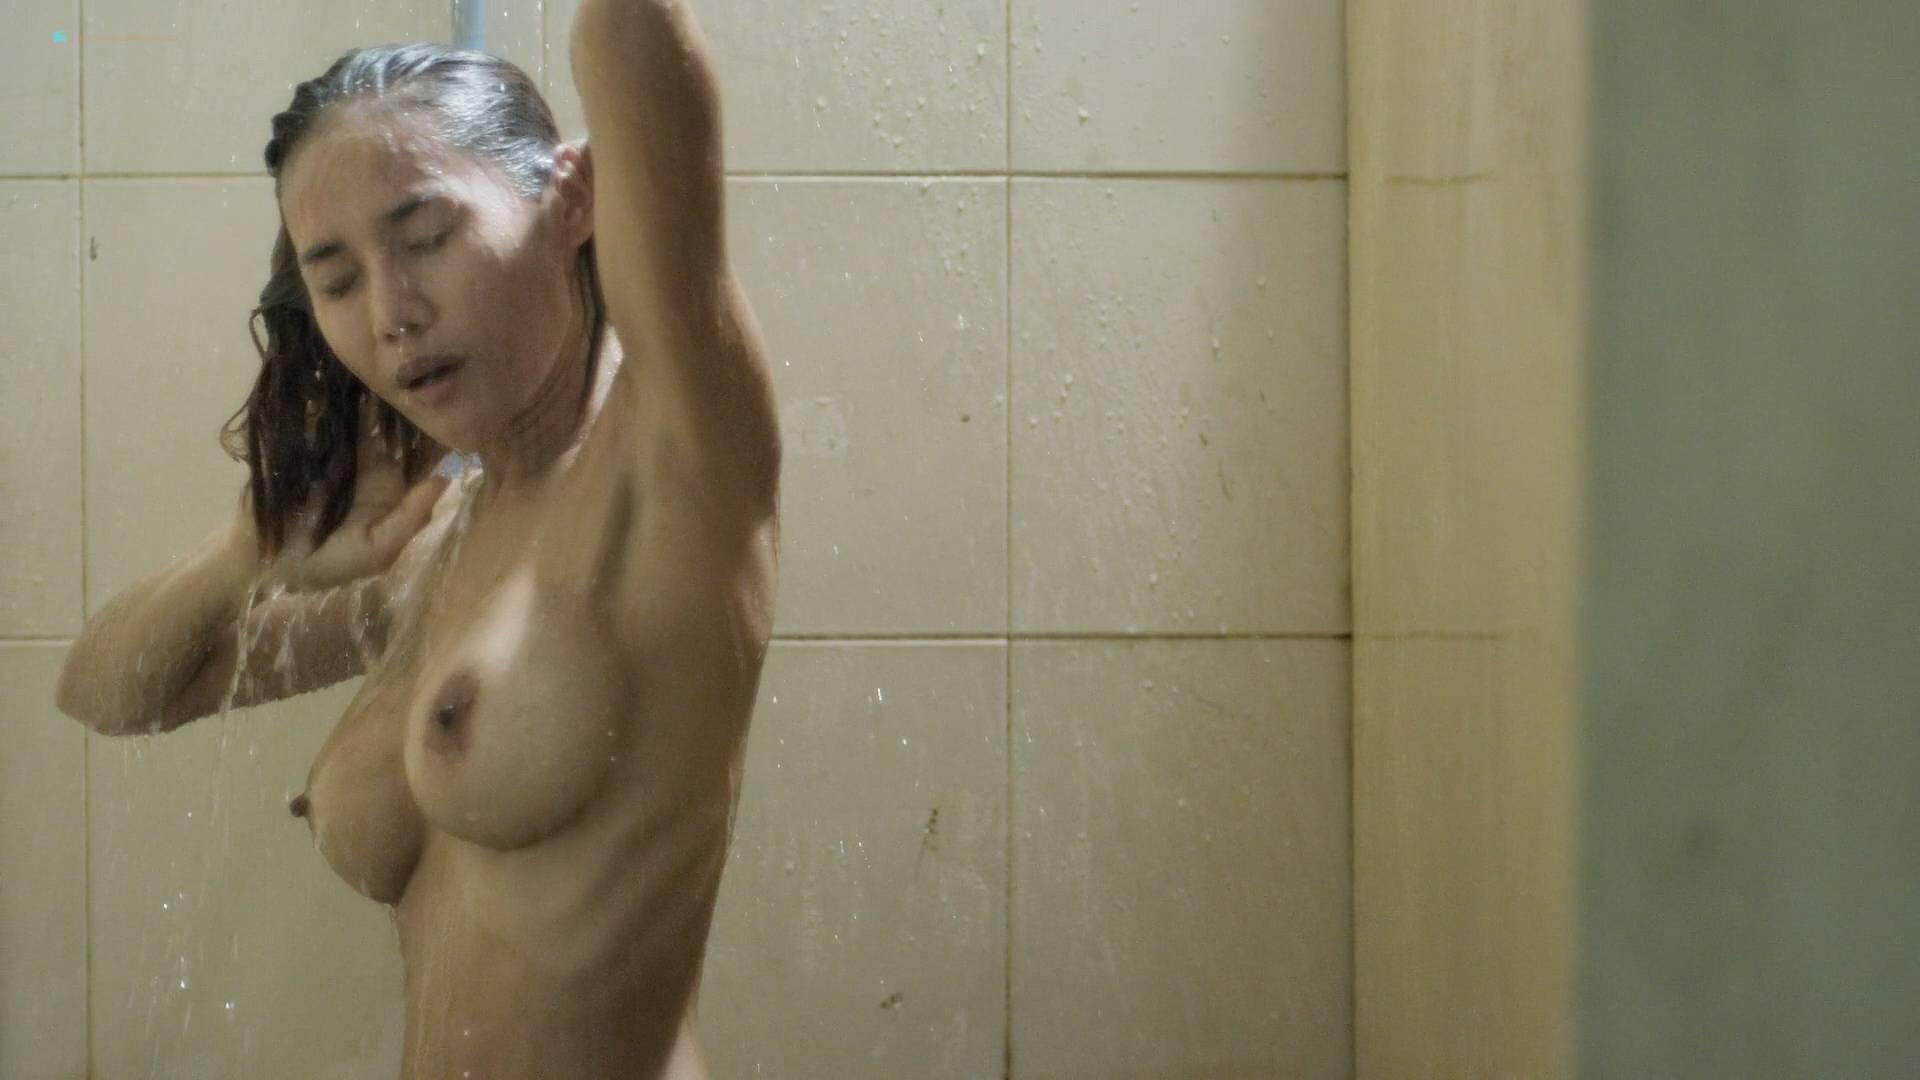 Kelly-McCart-nude-full-frontal-Katrina-Grey-nude-lesbian-sex-Locked-Up-2017-HD-1080p-Web-004.jpg